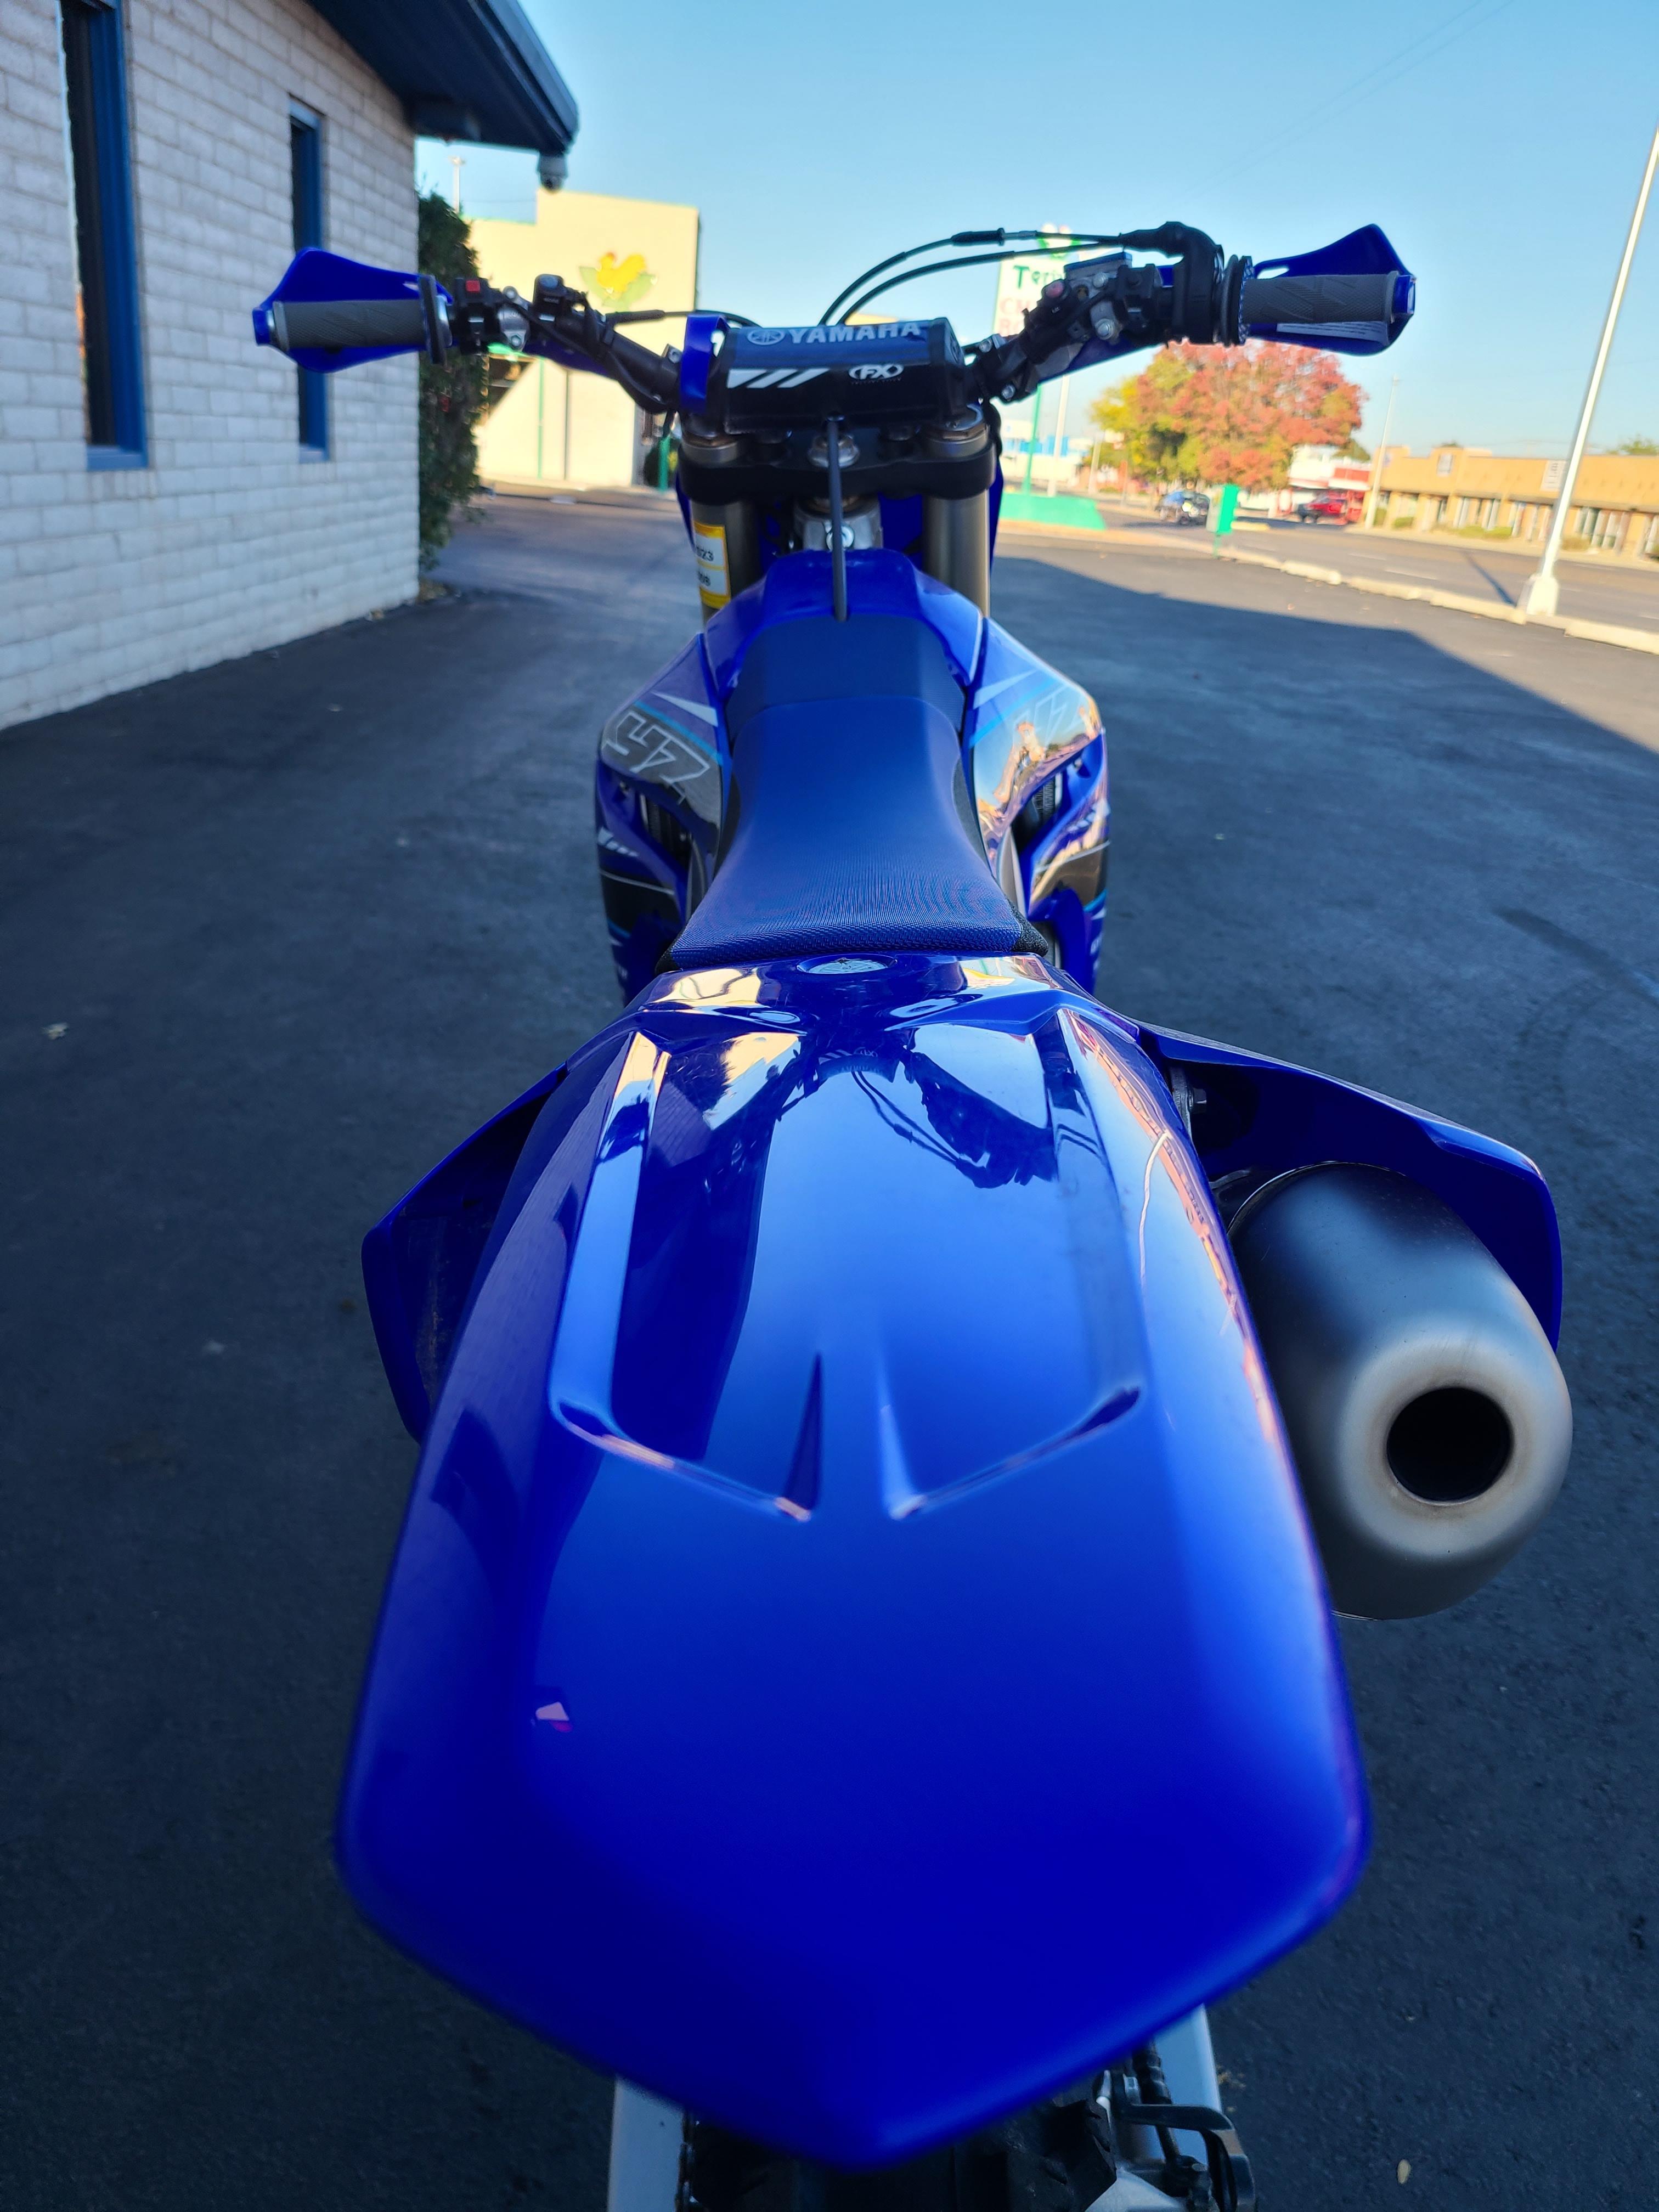 2021 Yamaha YZ 450F at Bobby J's Yamaha, Albuquerque, NM 87110